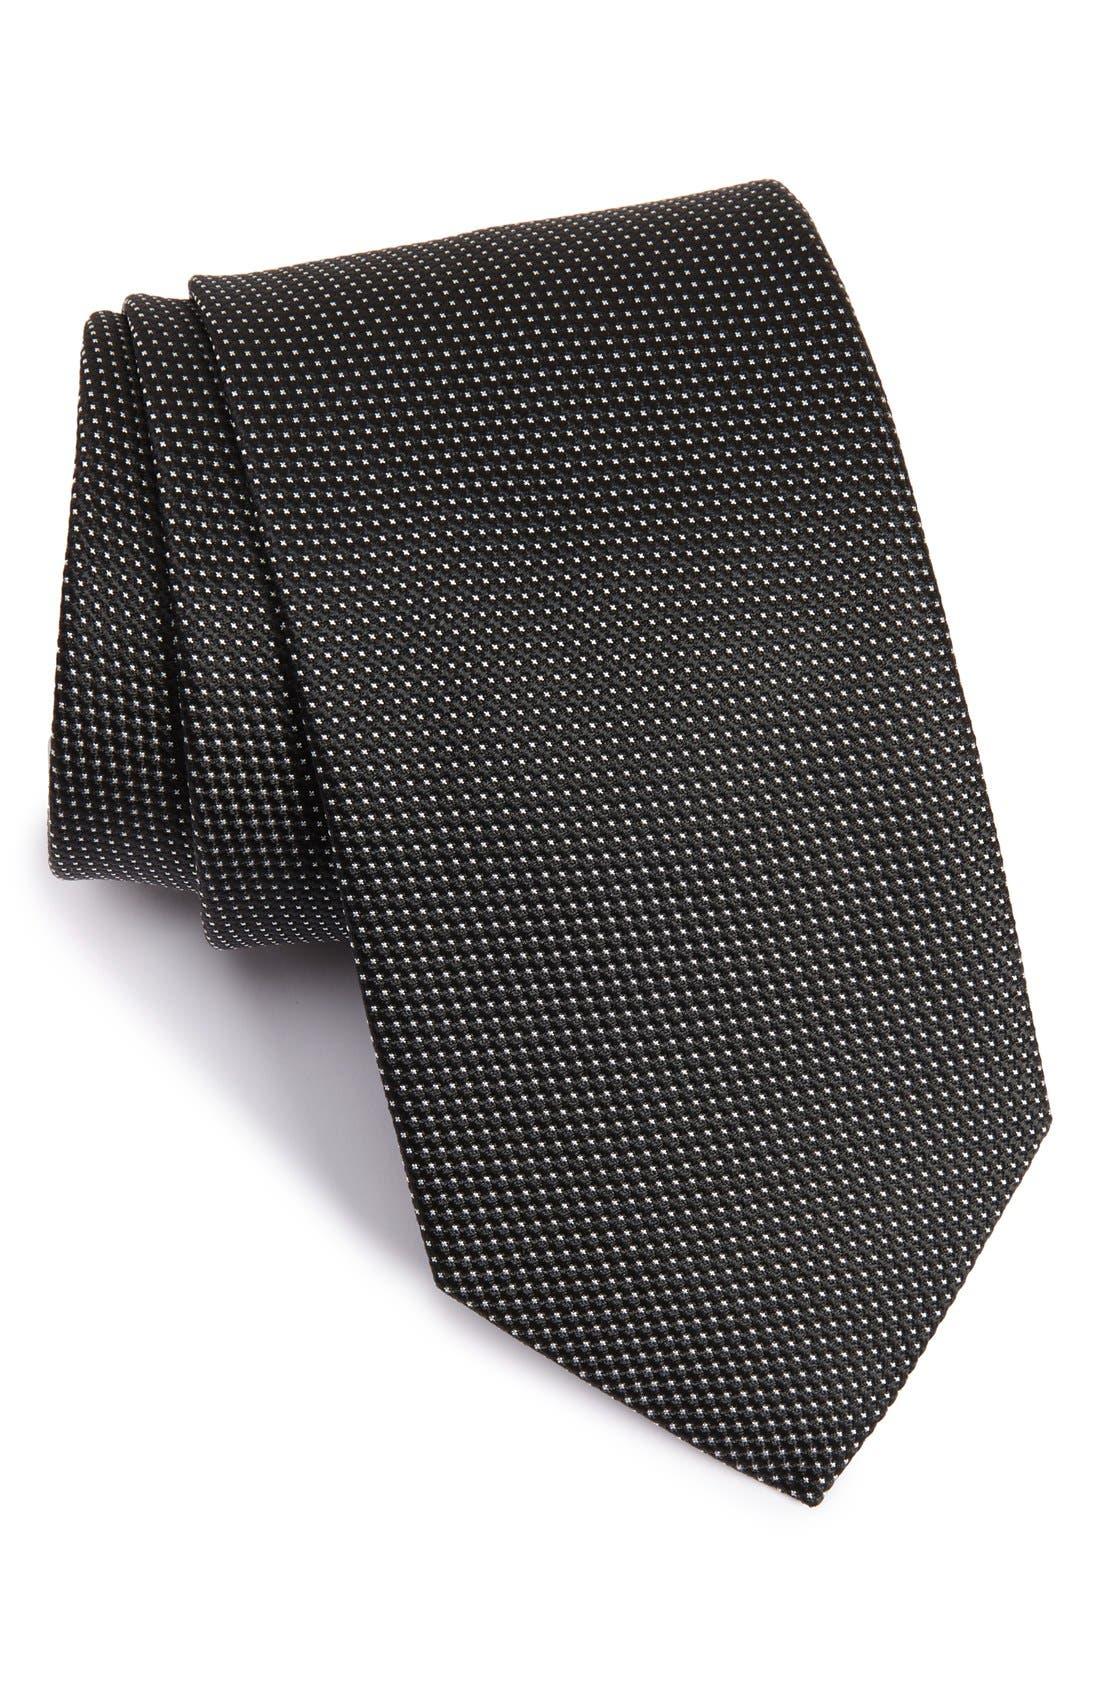 Microdot Silk Tie,                         Main,                         color, BLACK